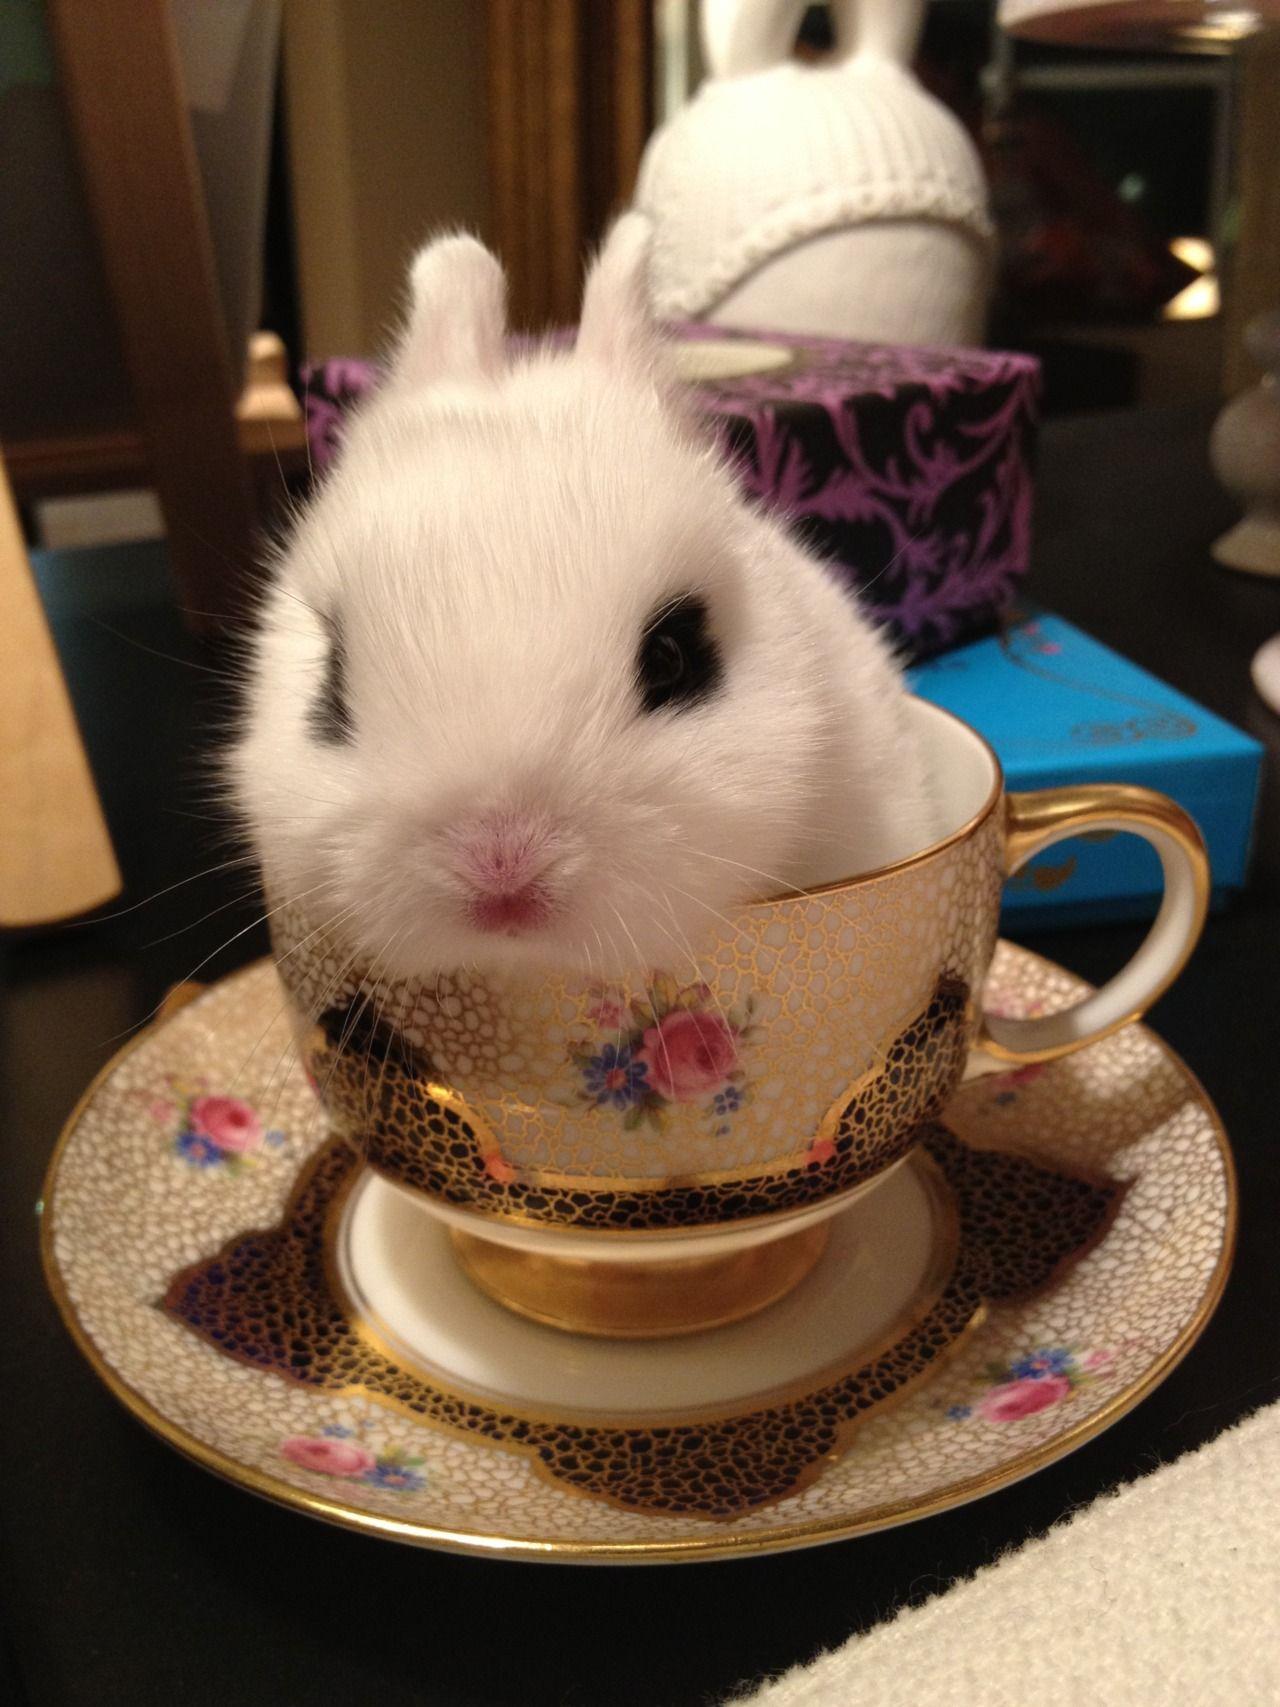 Bunny In A Teacup On Pinterest Teacups Bunnies And Baby